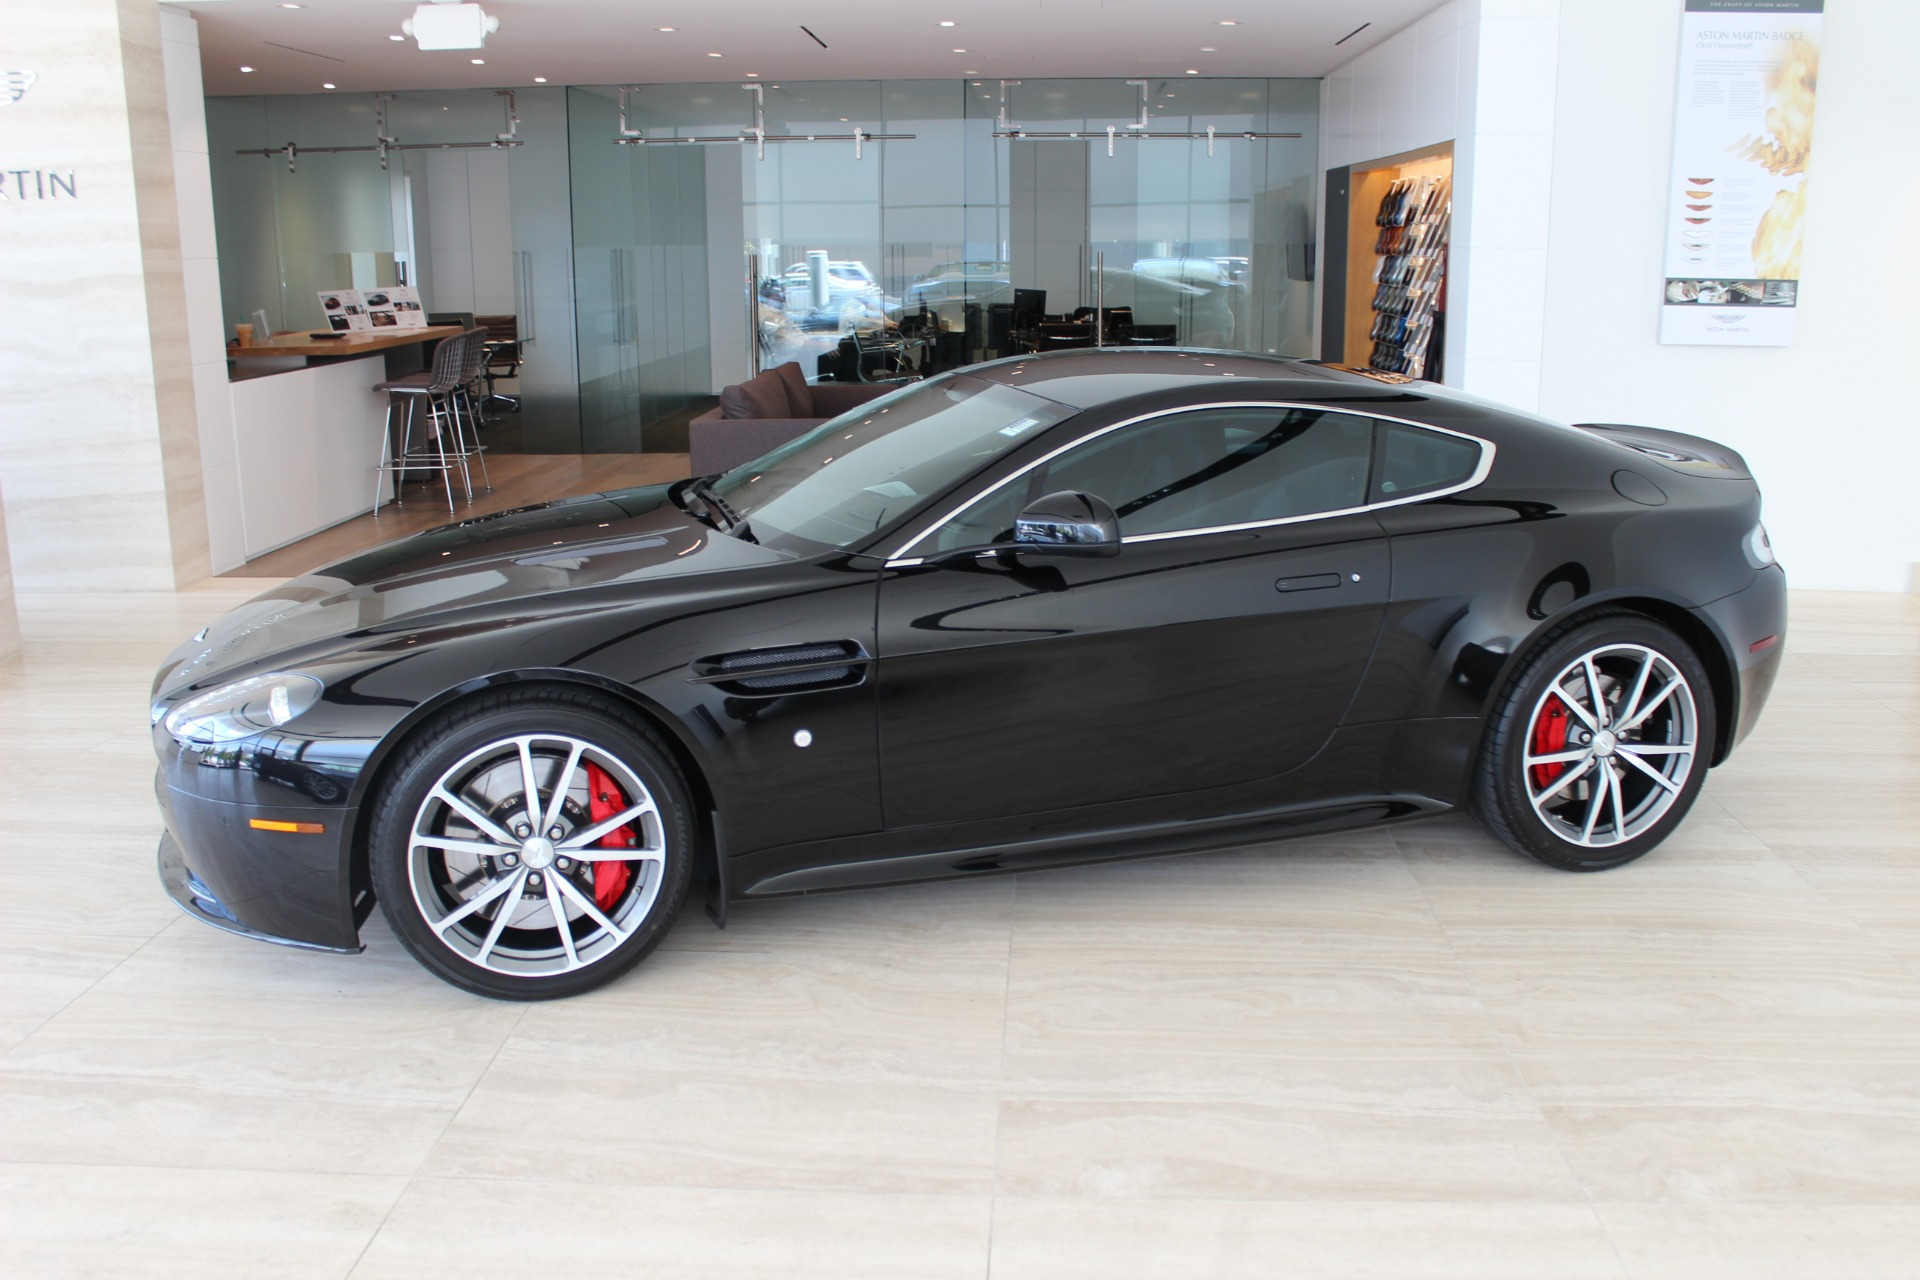 2012 Aston Martin V8 Vantage S Stock 7nl01619a For Sale Near